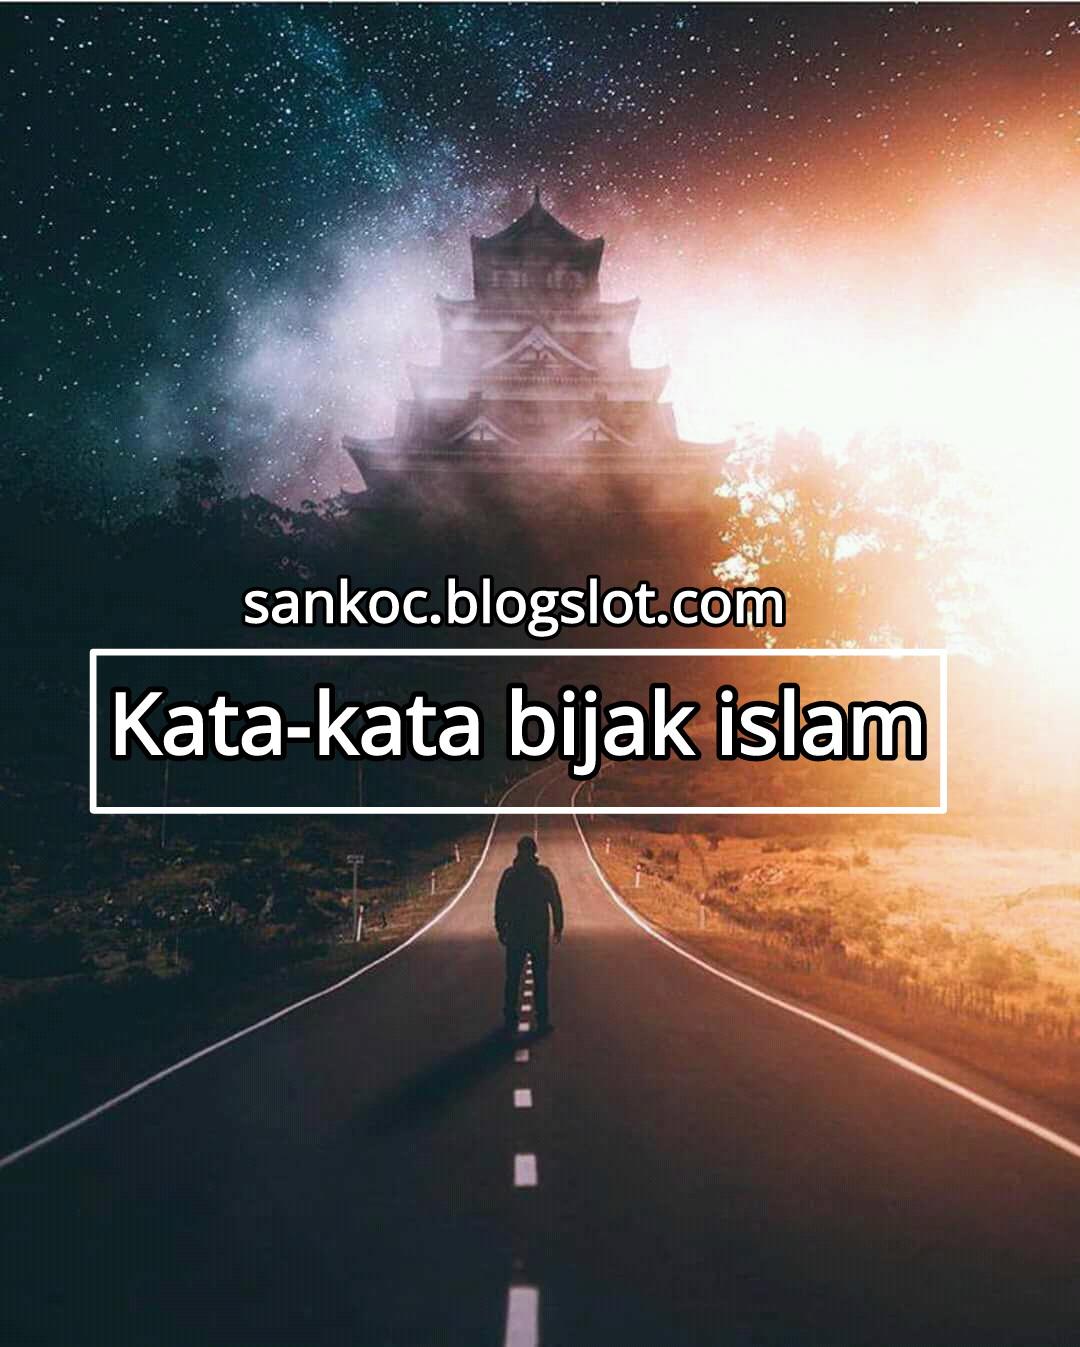 Kumpulan Kata Kata Bijak Islam Kumpulan Kata Kata